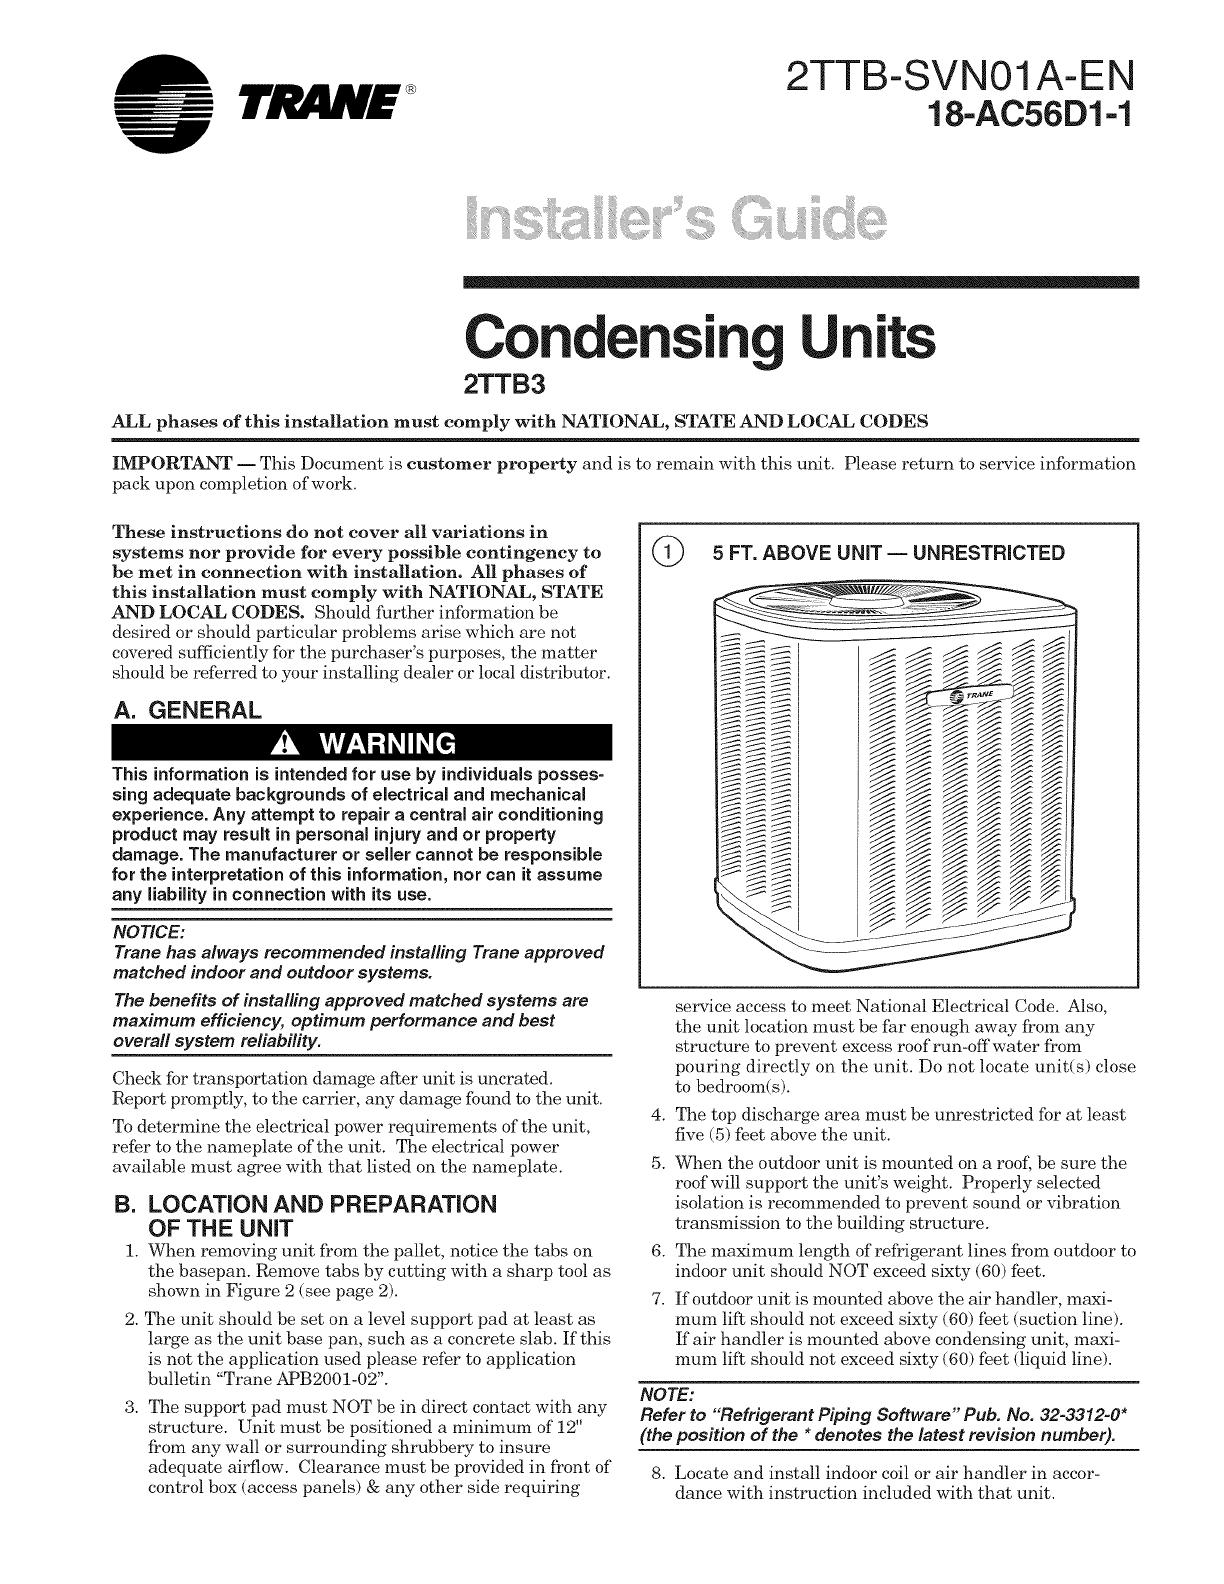 Trane Central Air Conditioner Manual   Sante Blog